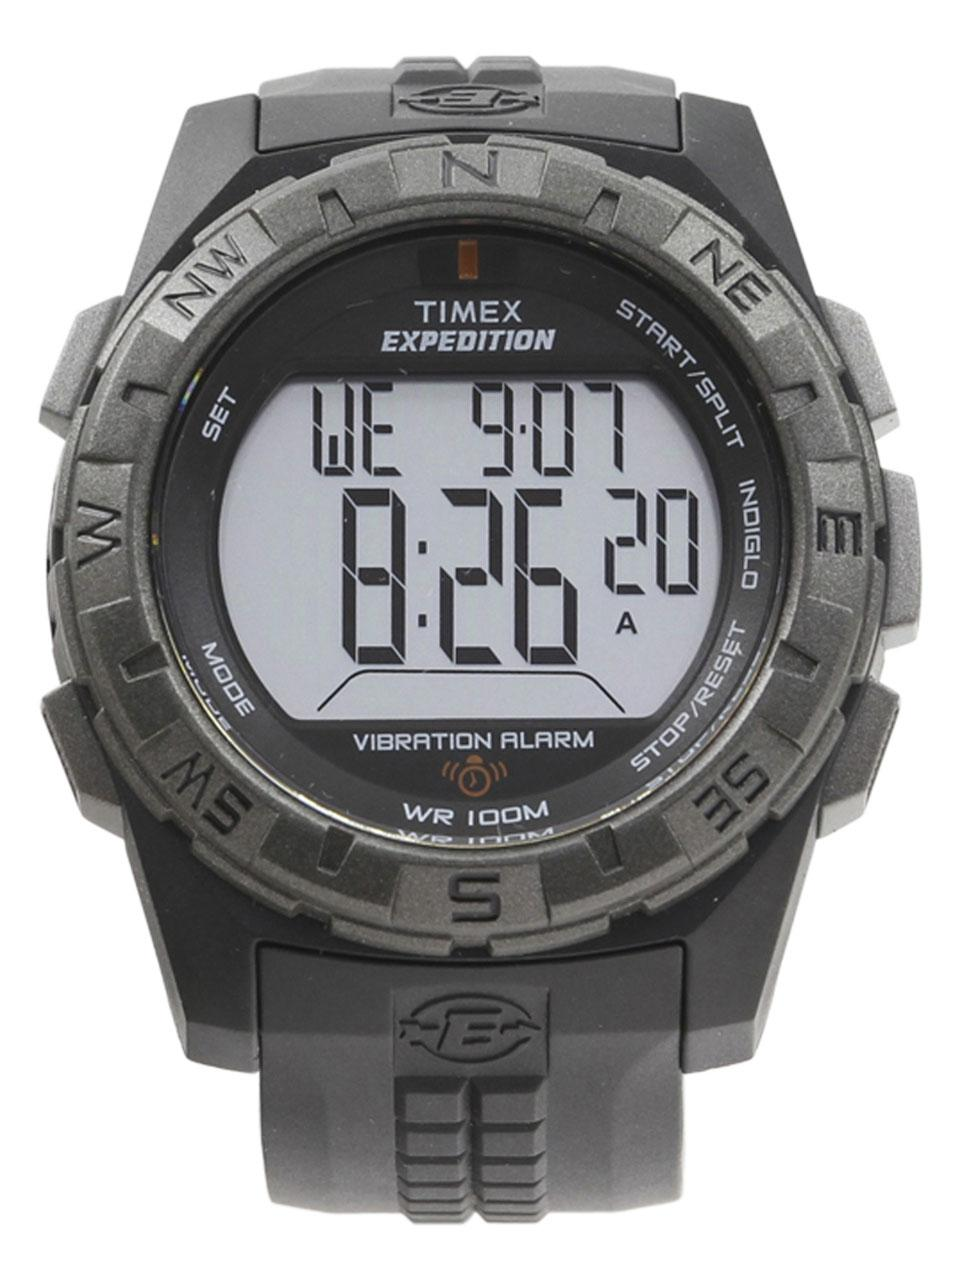 b40916250983 Timex Men s T49851 Expedition Vibration Alarm Black Digital Watch